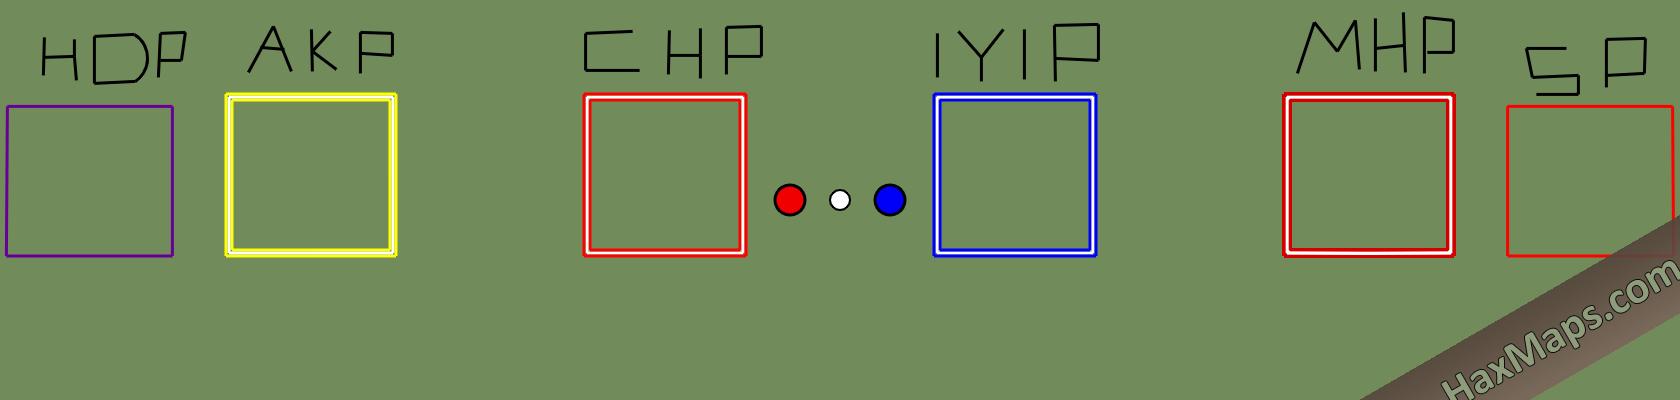 hax ball maps | Dirilis Secim Map